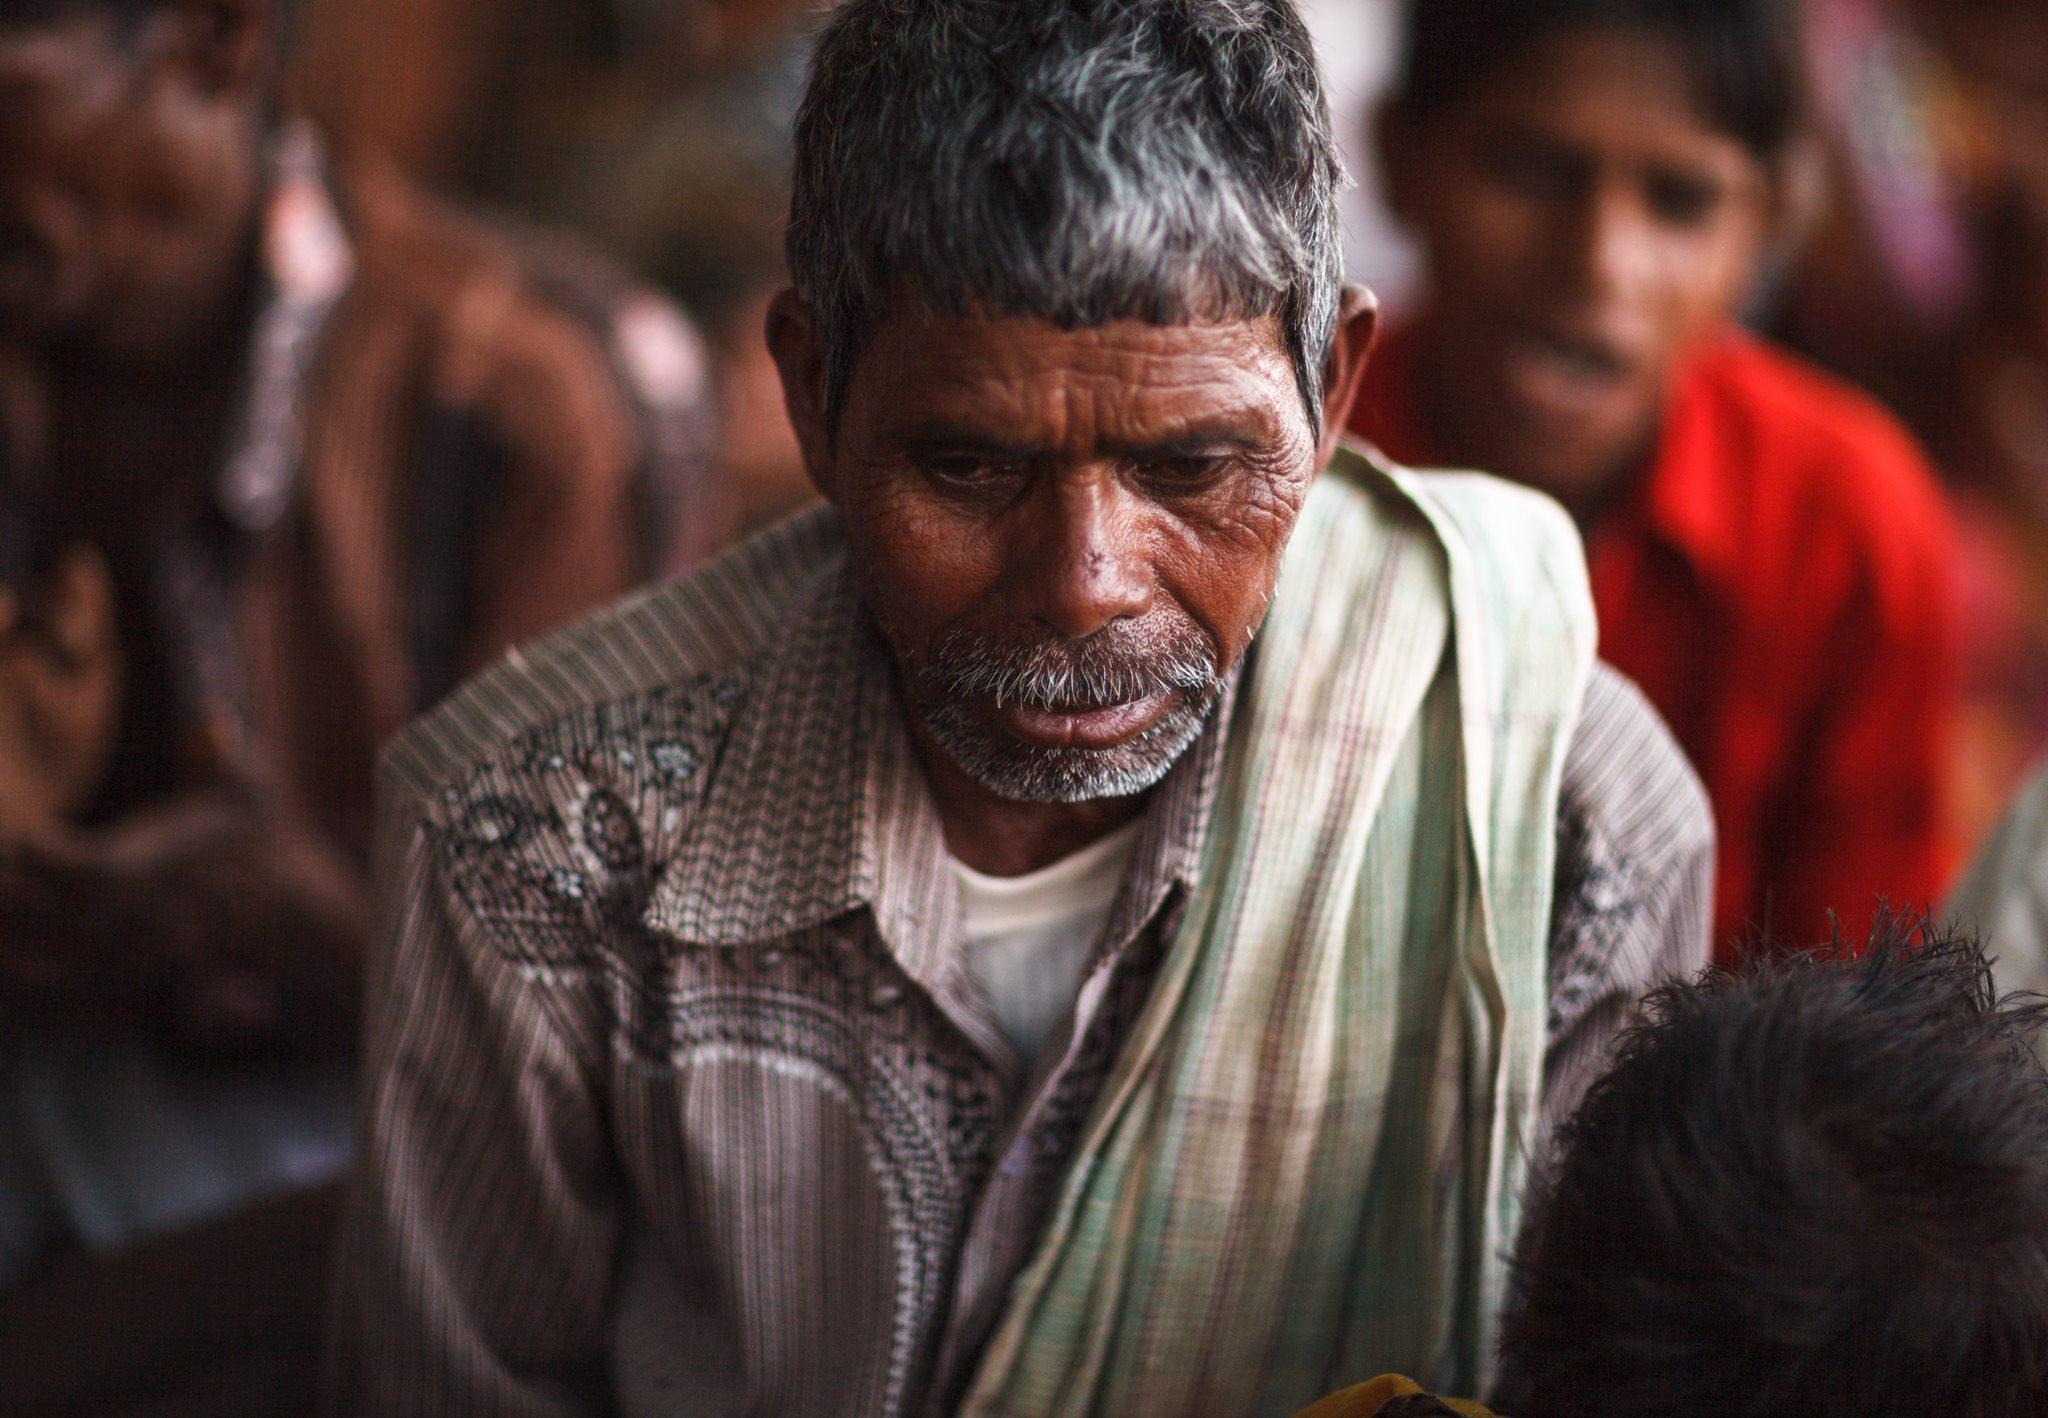 Congregation, women, children beaten in east India village